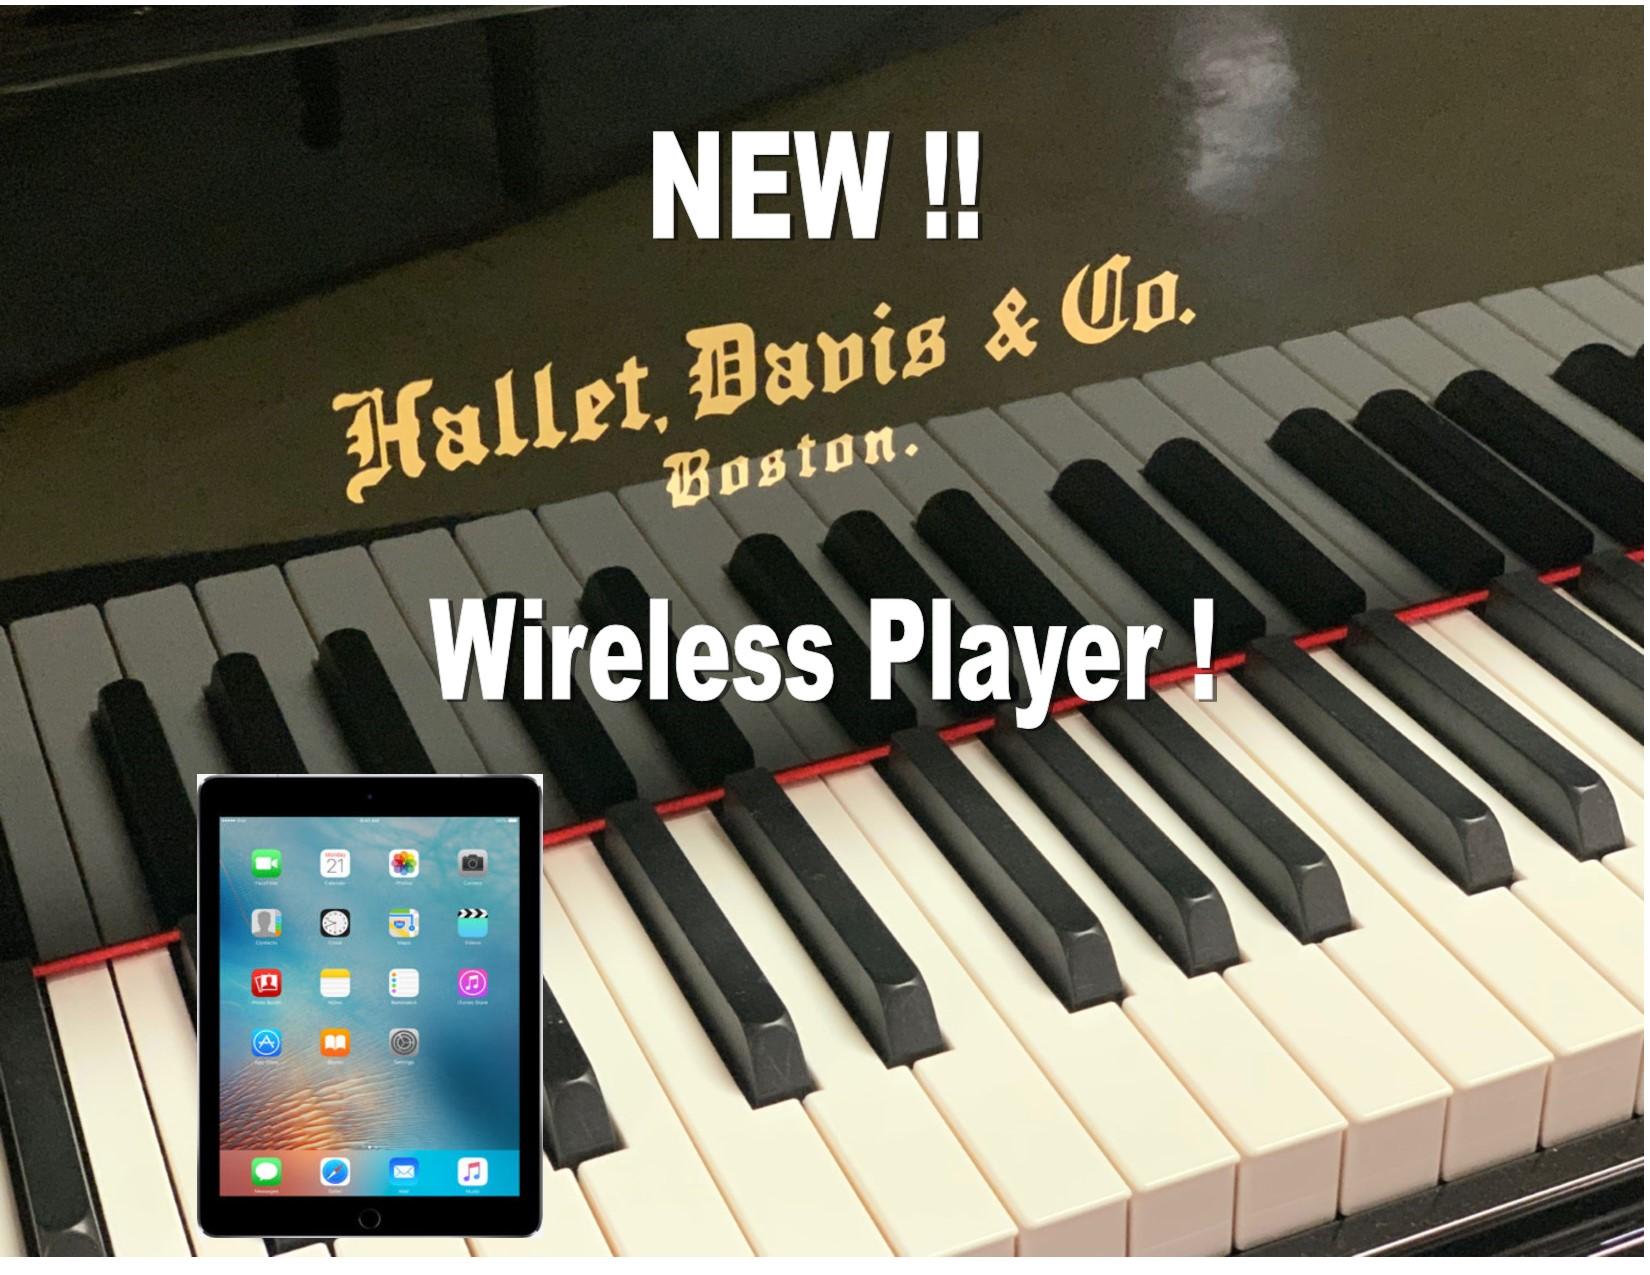 "12461-<br><font color=black><b>Hallet Davis</b></font> 5'0″ Premium Grade Grand w/State of the Art QRS Wireless Player System<br><font color=blue><b>Click Picture for ""Live Video""</b></font>"